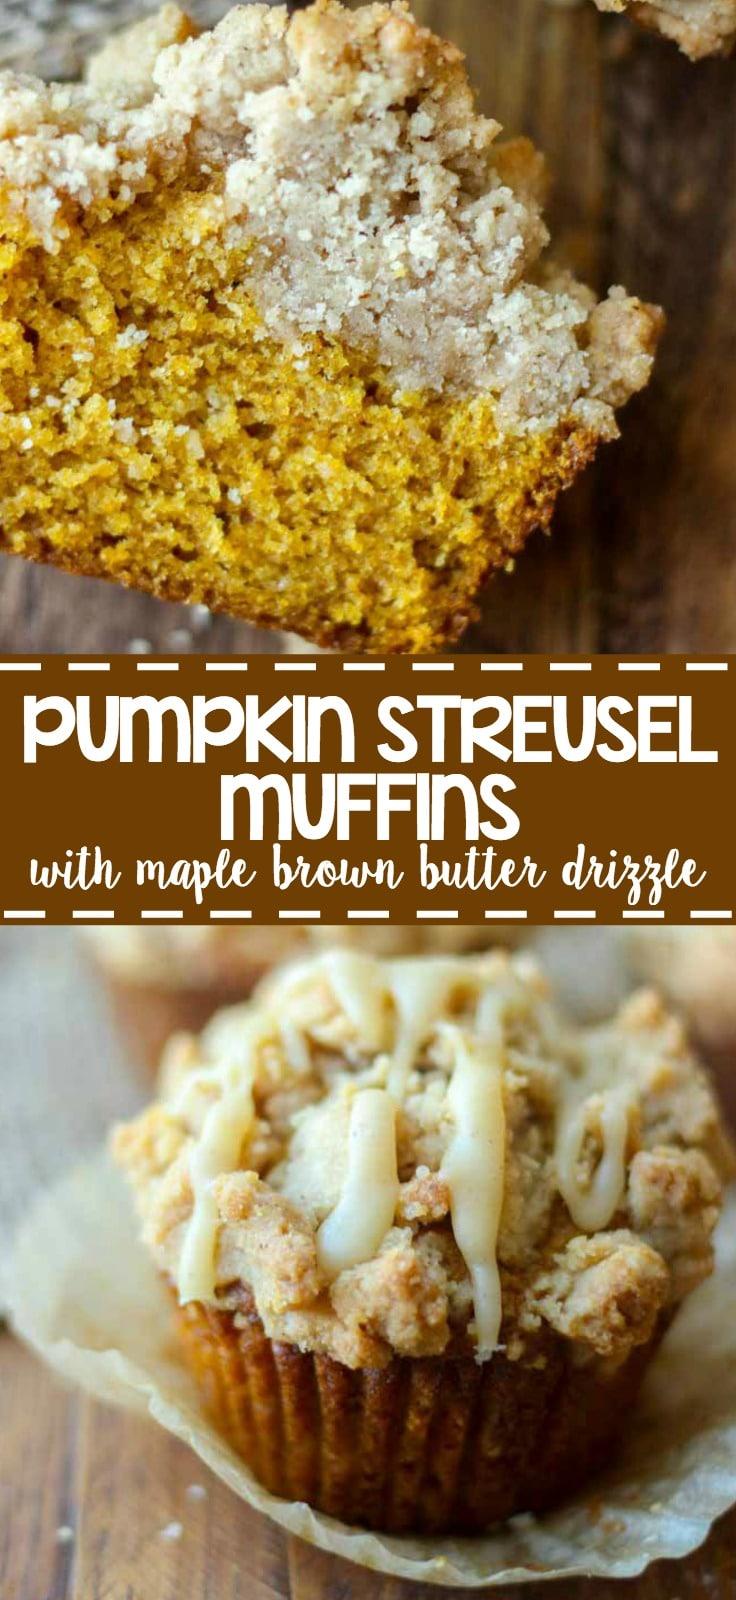 pumpkin-spice-streusel-muffins